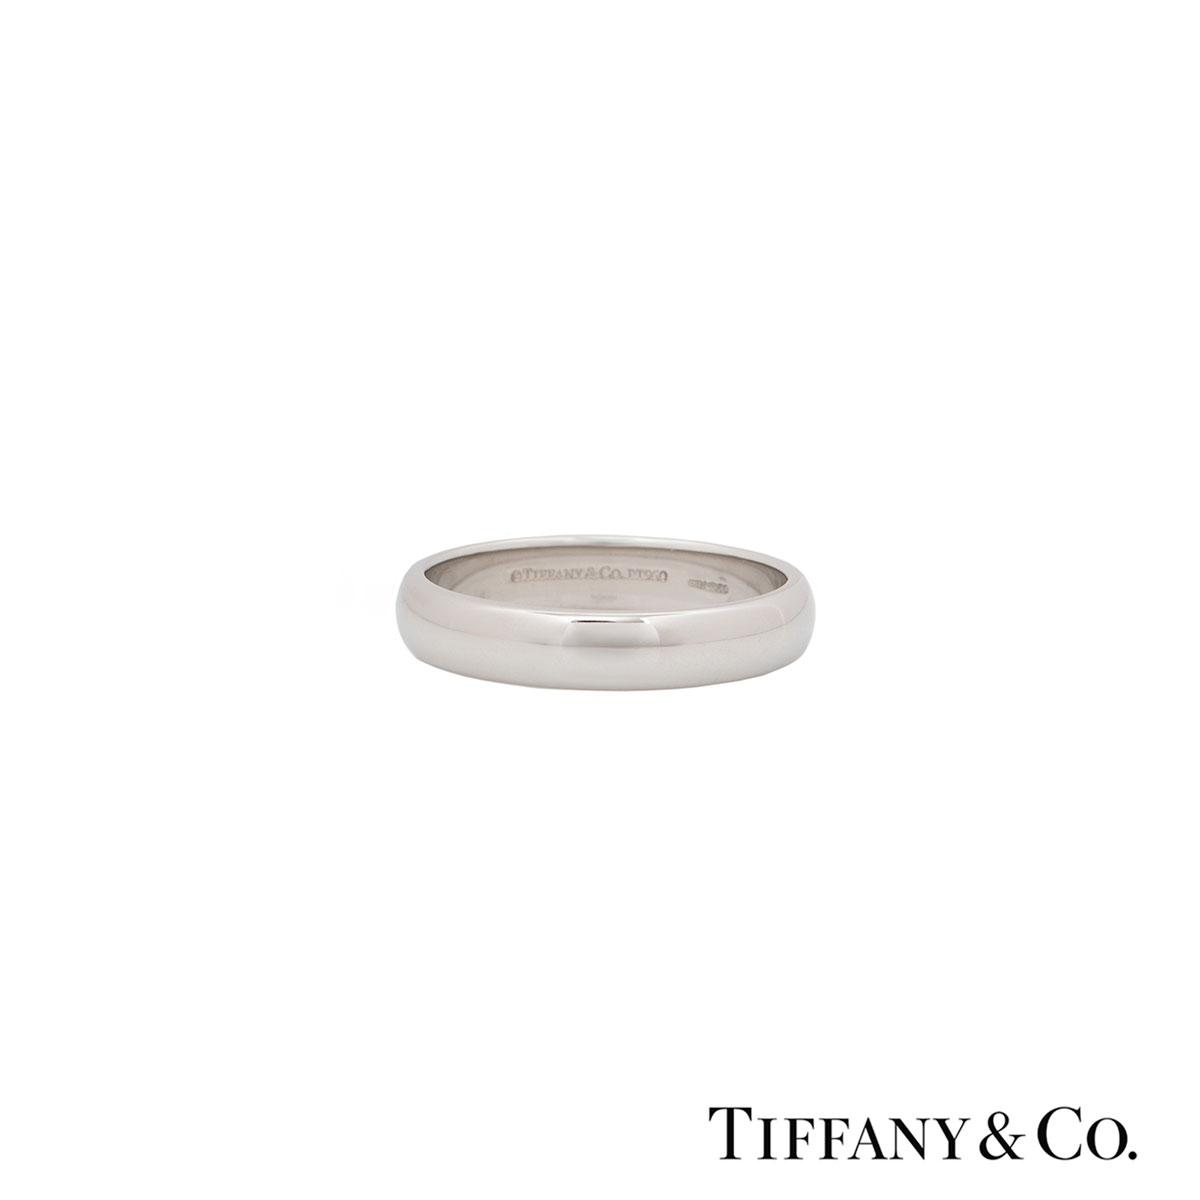 Tiffany & Co. Platinum Lucida Wedding Band